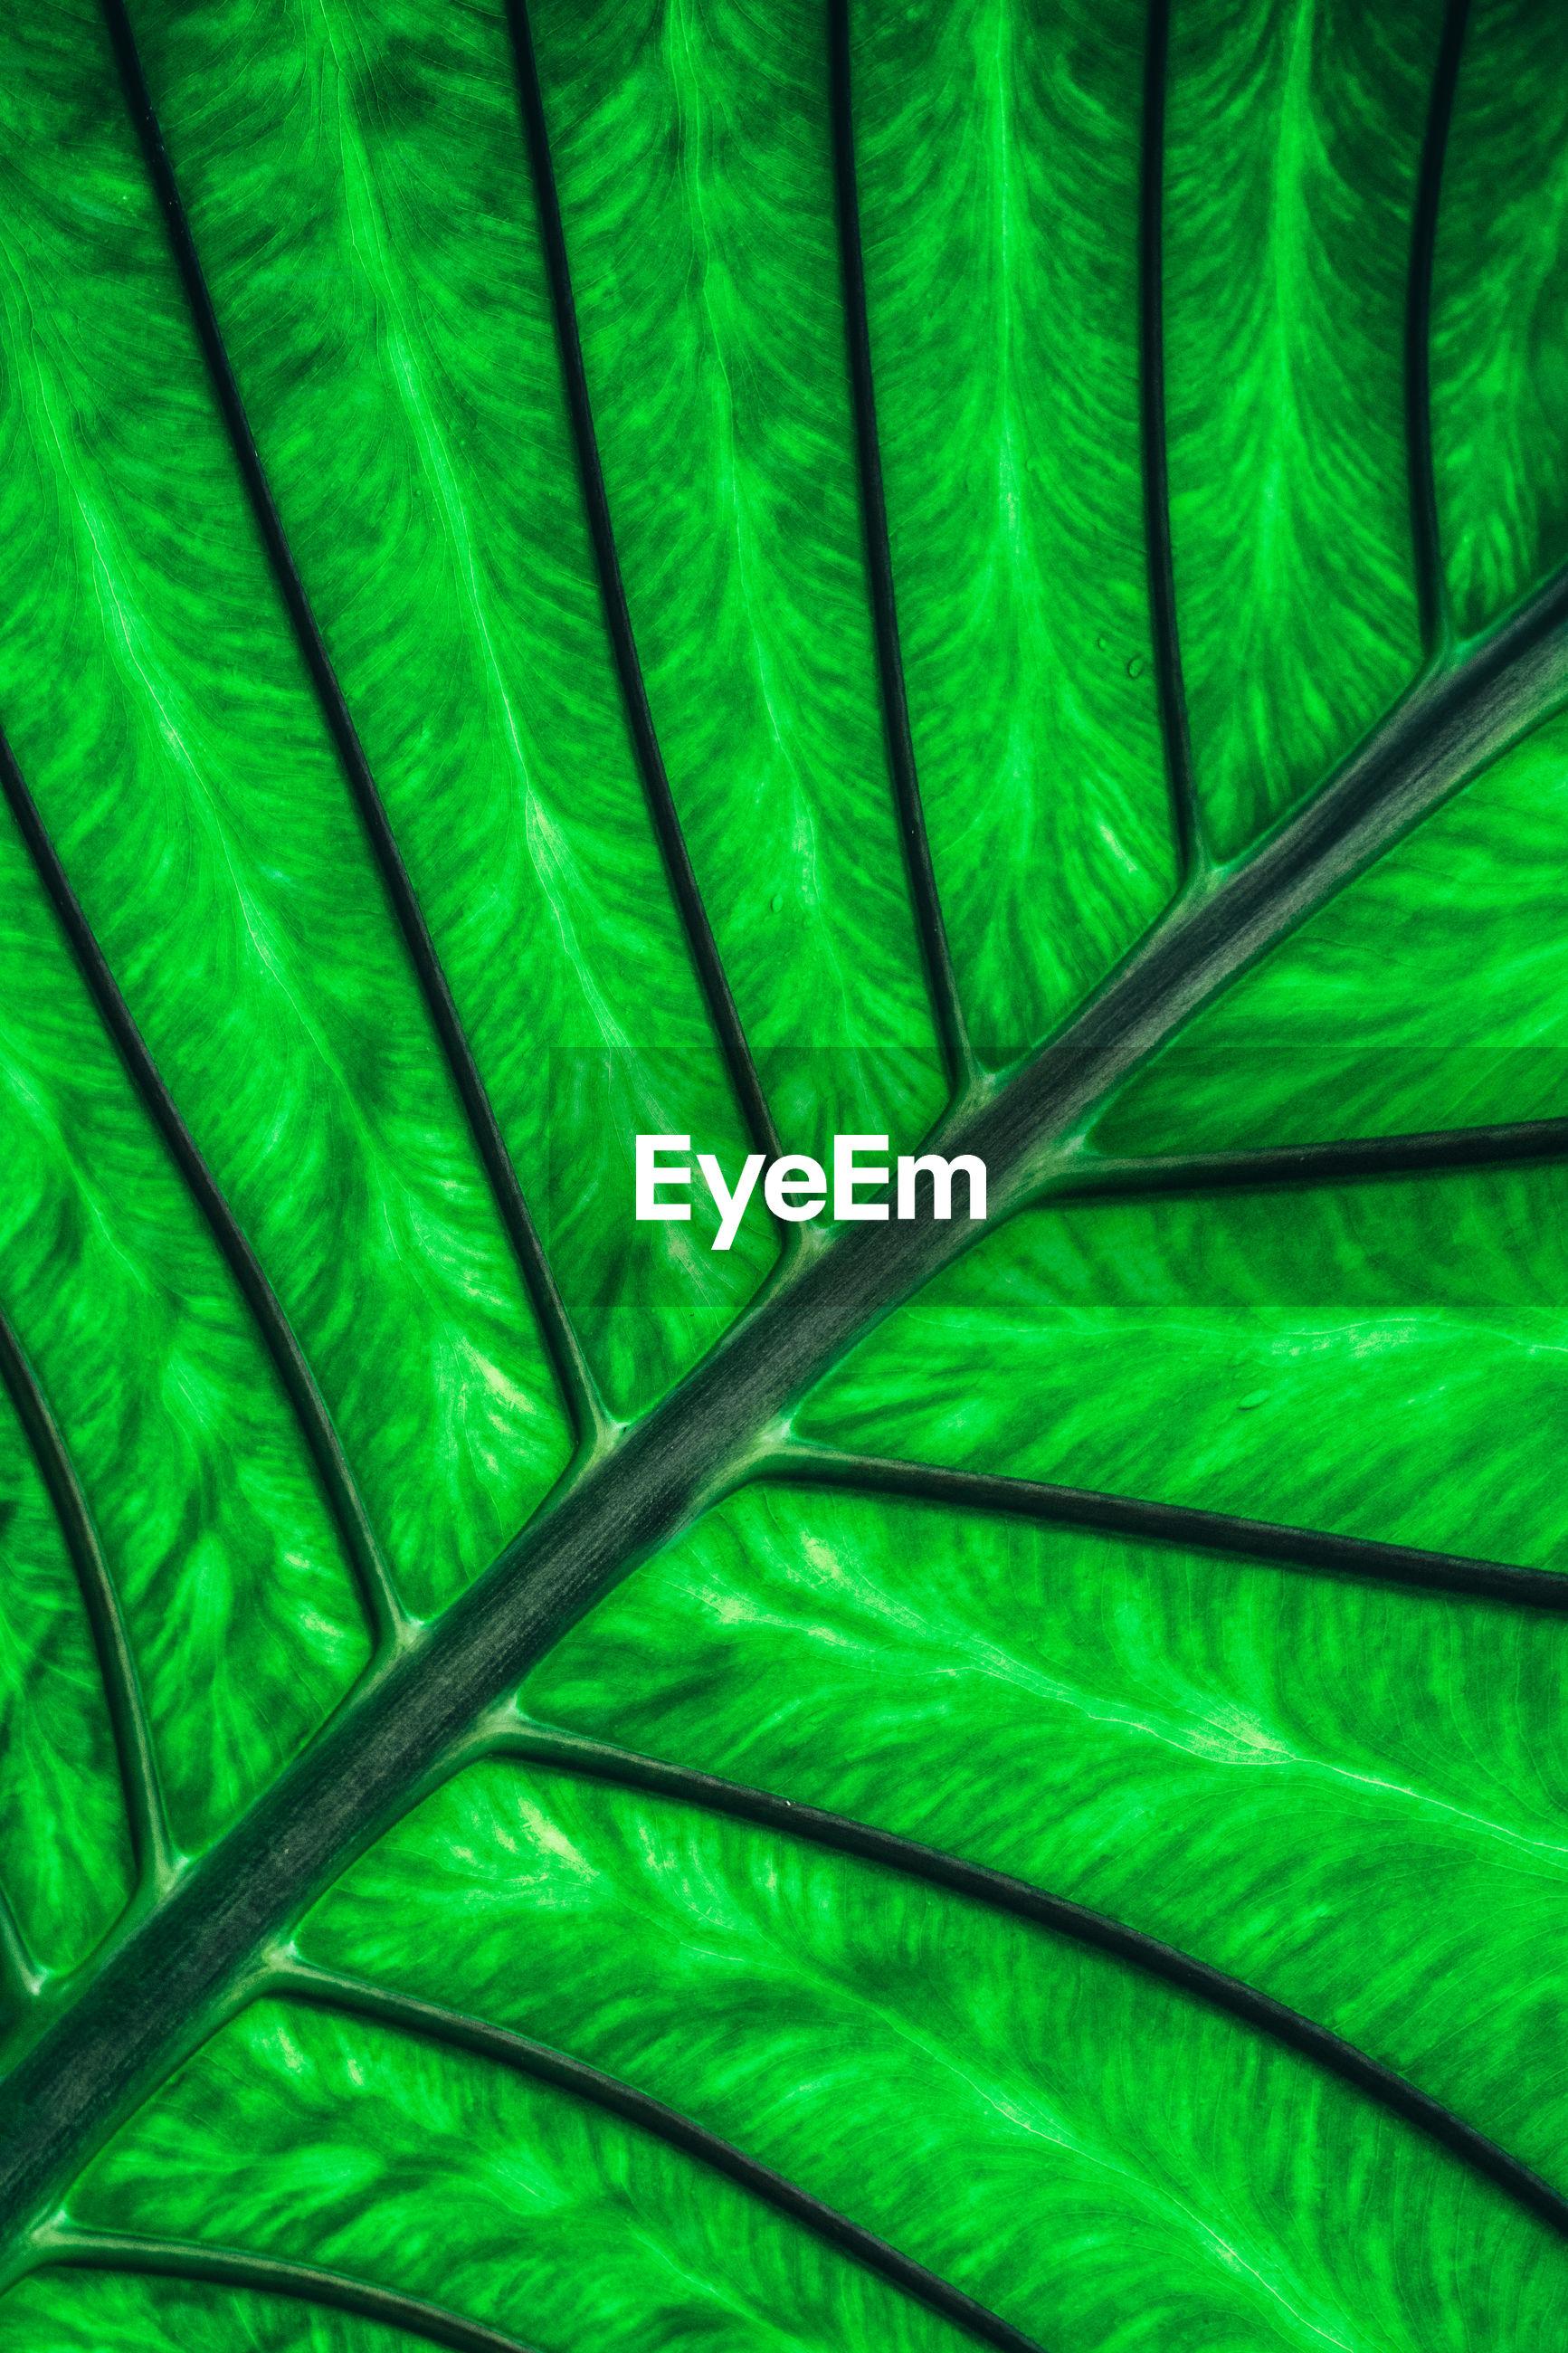 Full frame shot of feather on leaf